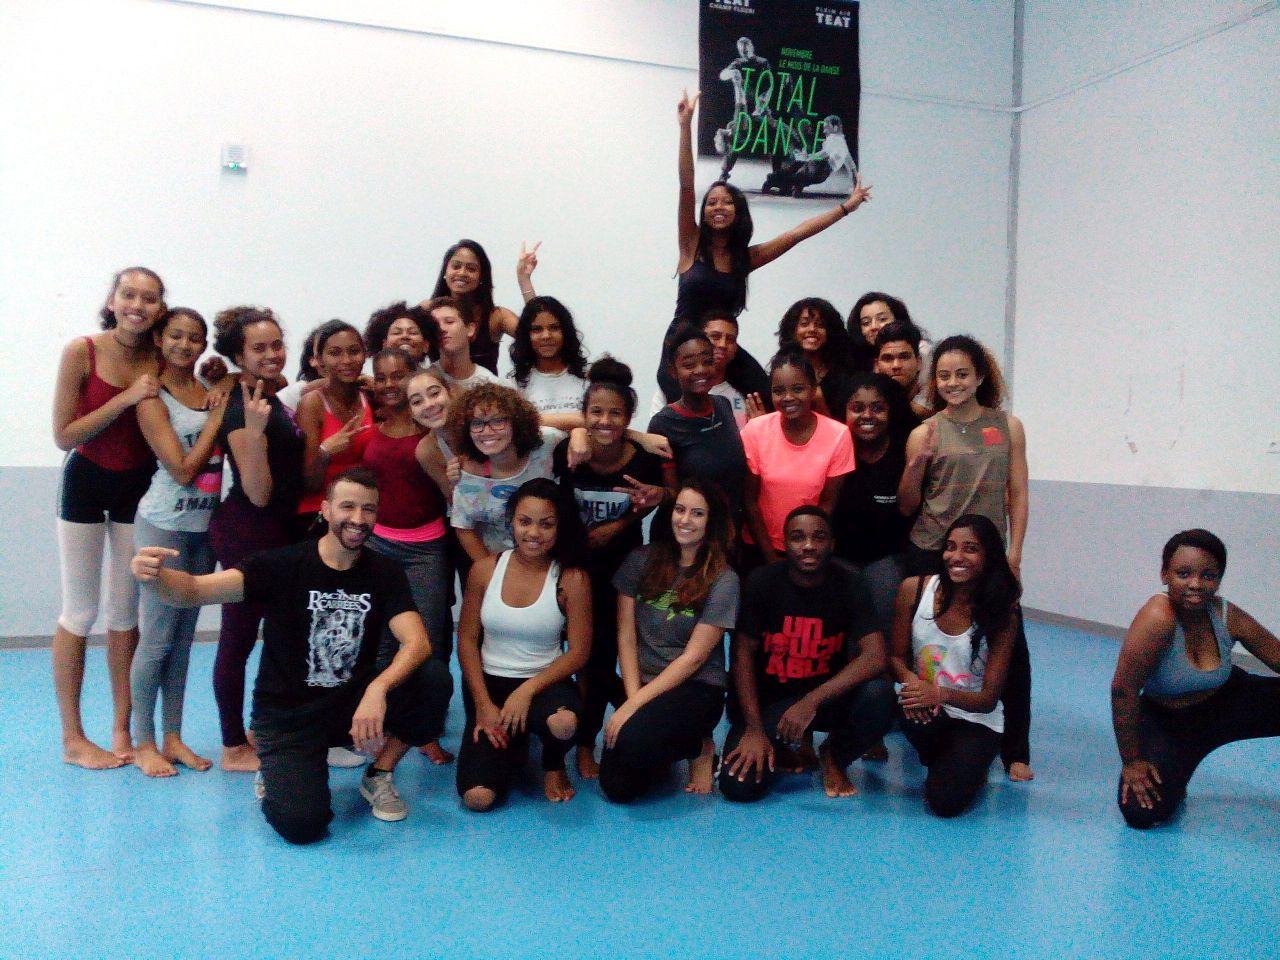 danse20septembre20106n4